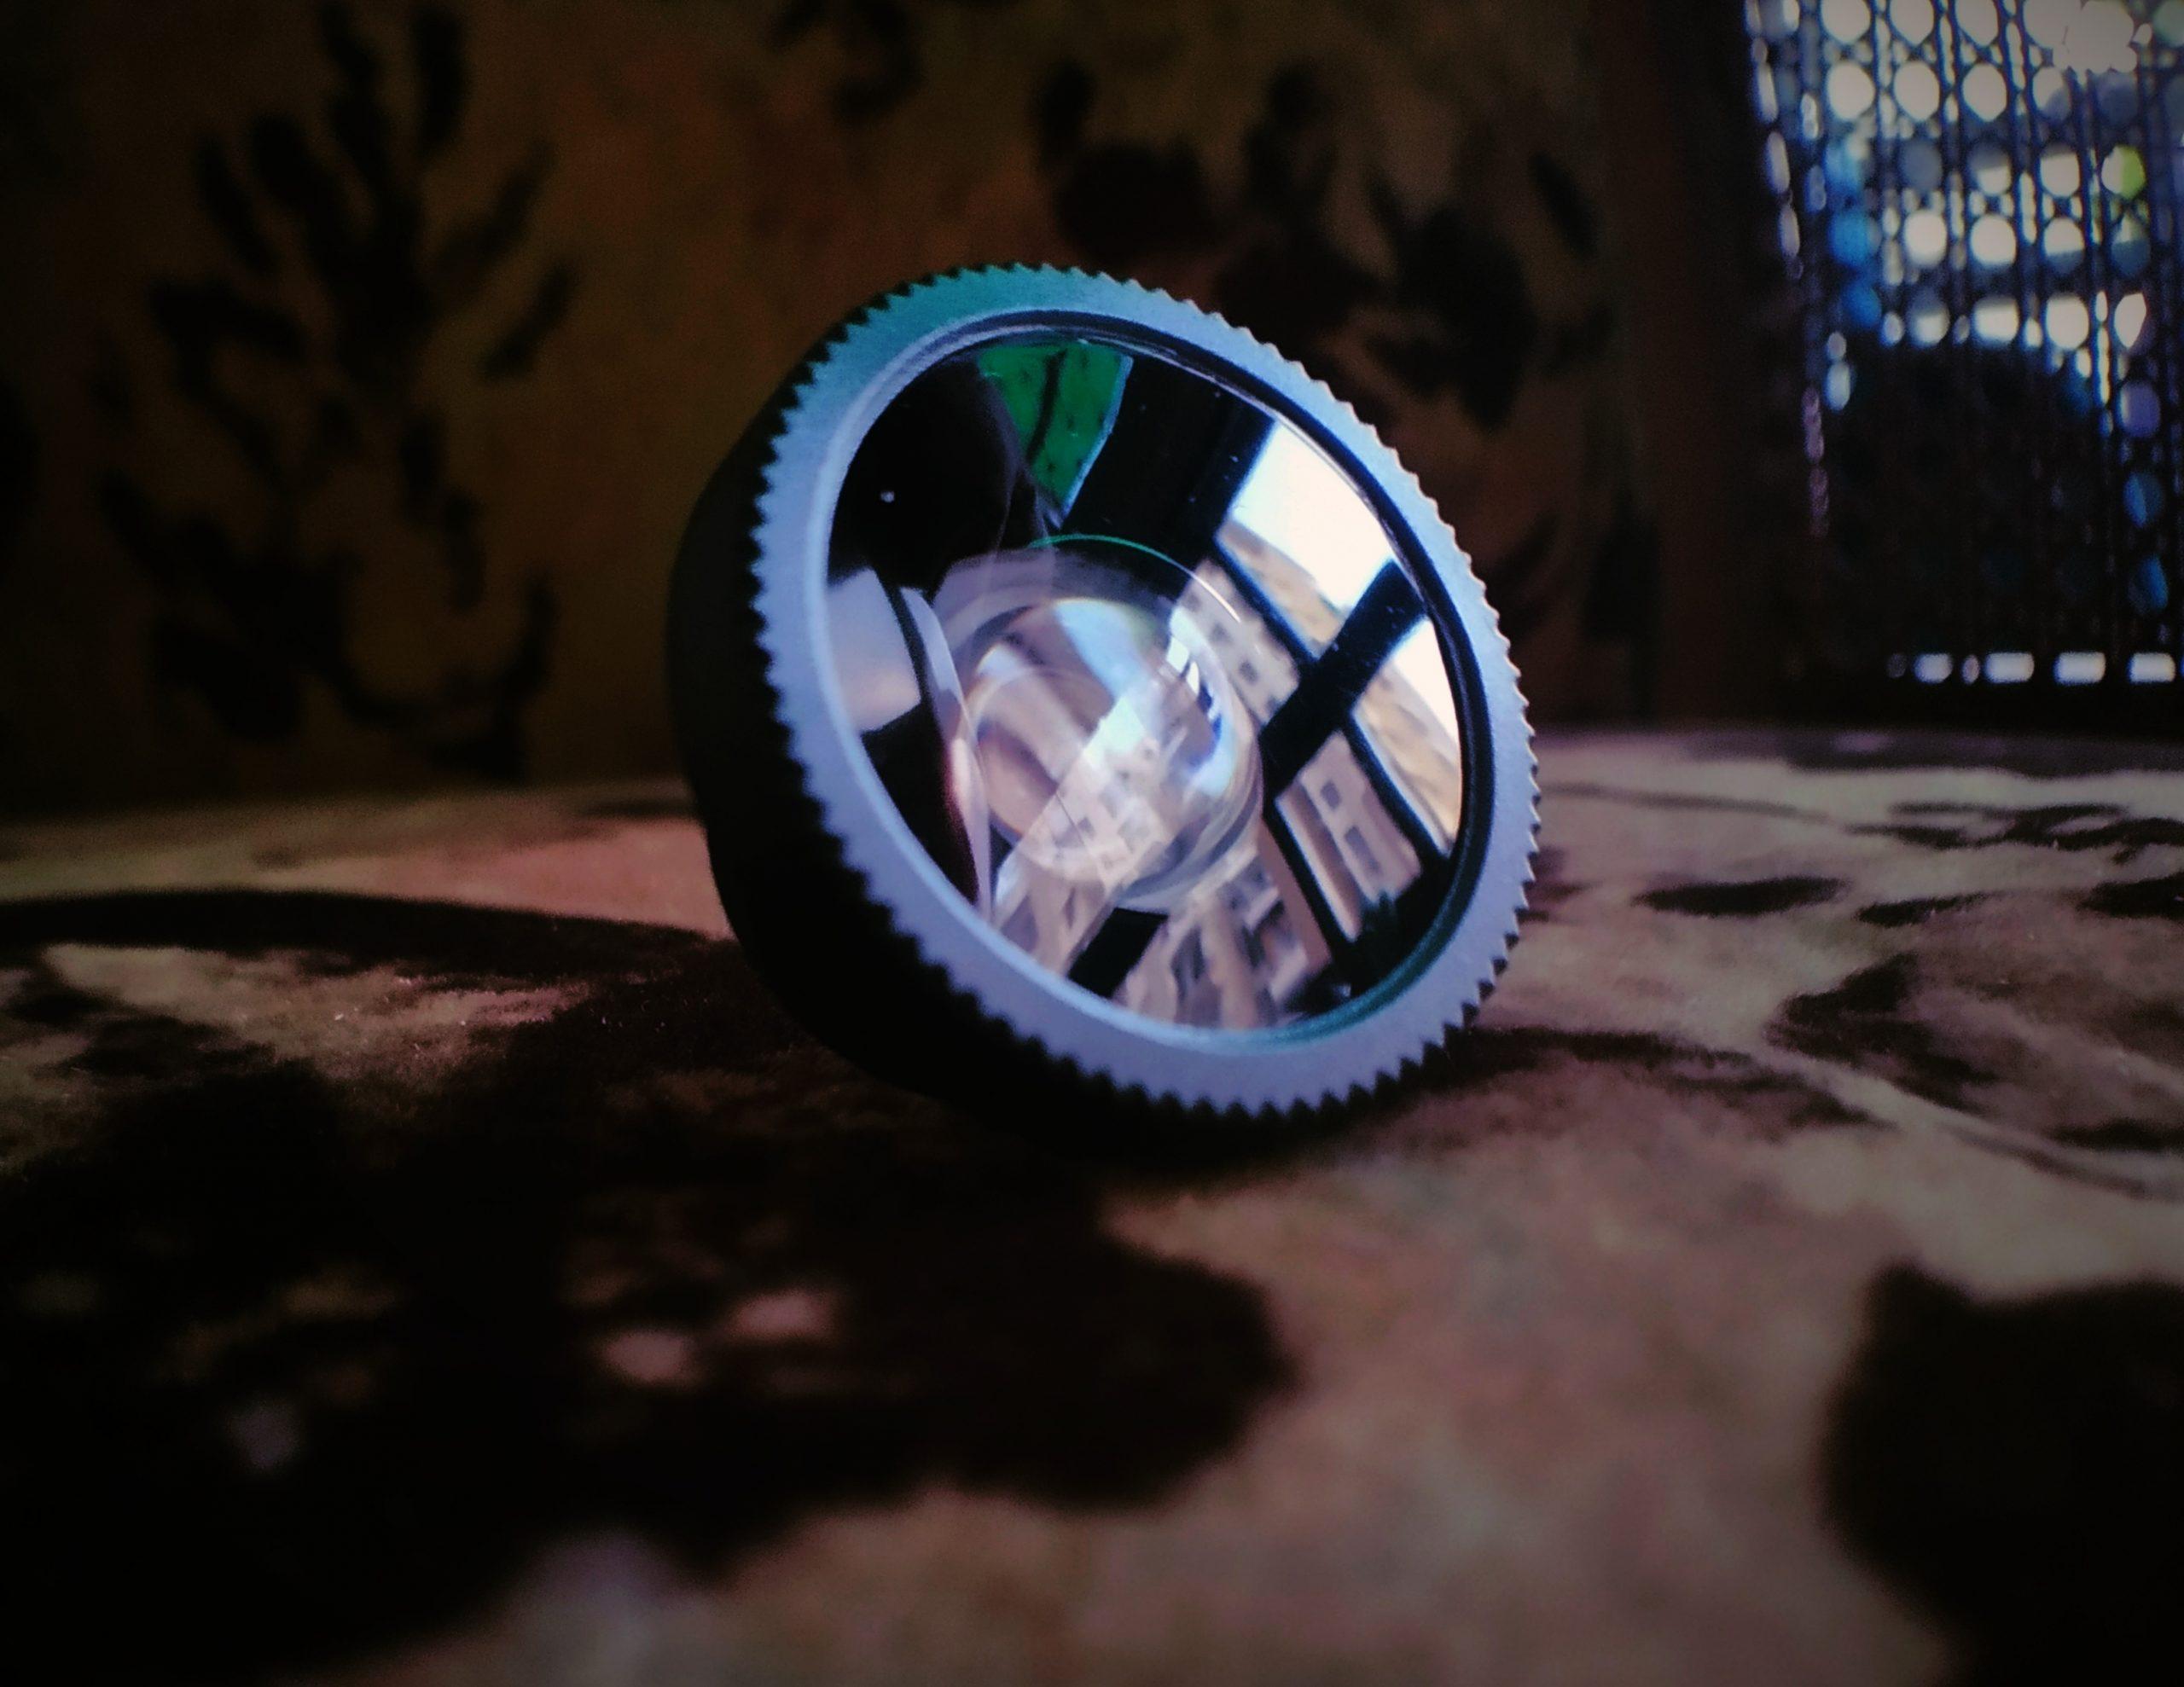 Fisheye lens for photography